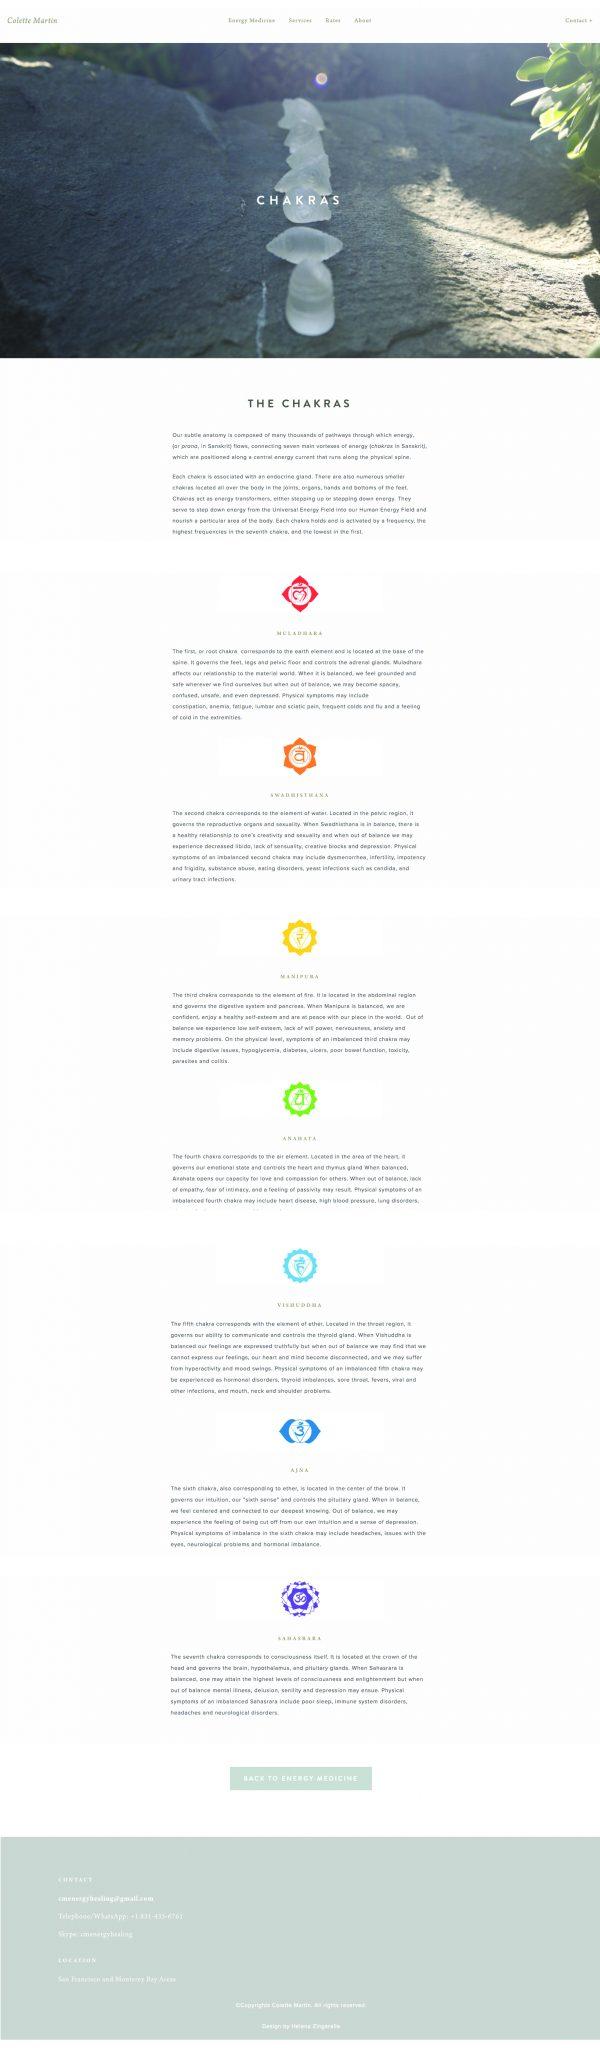 Helena Zingarella ~ Web-design